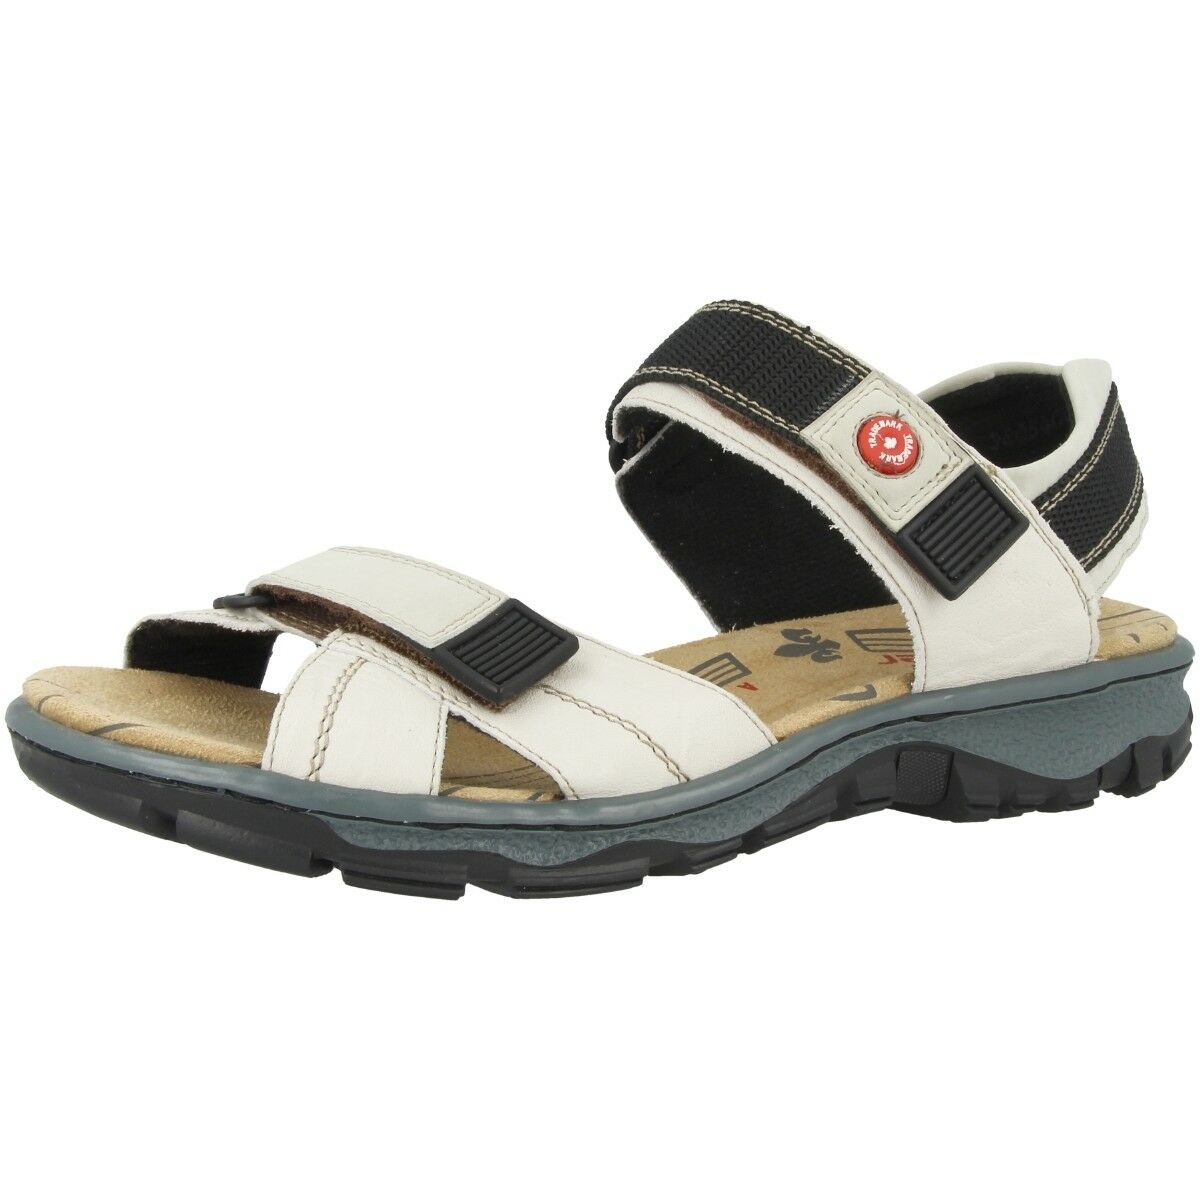 Rieker Massa-Buk zapatos Outdoor Anti-stress Sandal Anti-stress Outdoor Ankle-Strap Beige 68851-60 fda20a